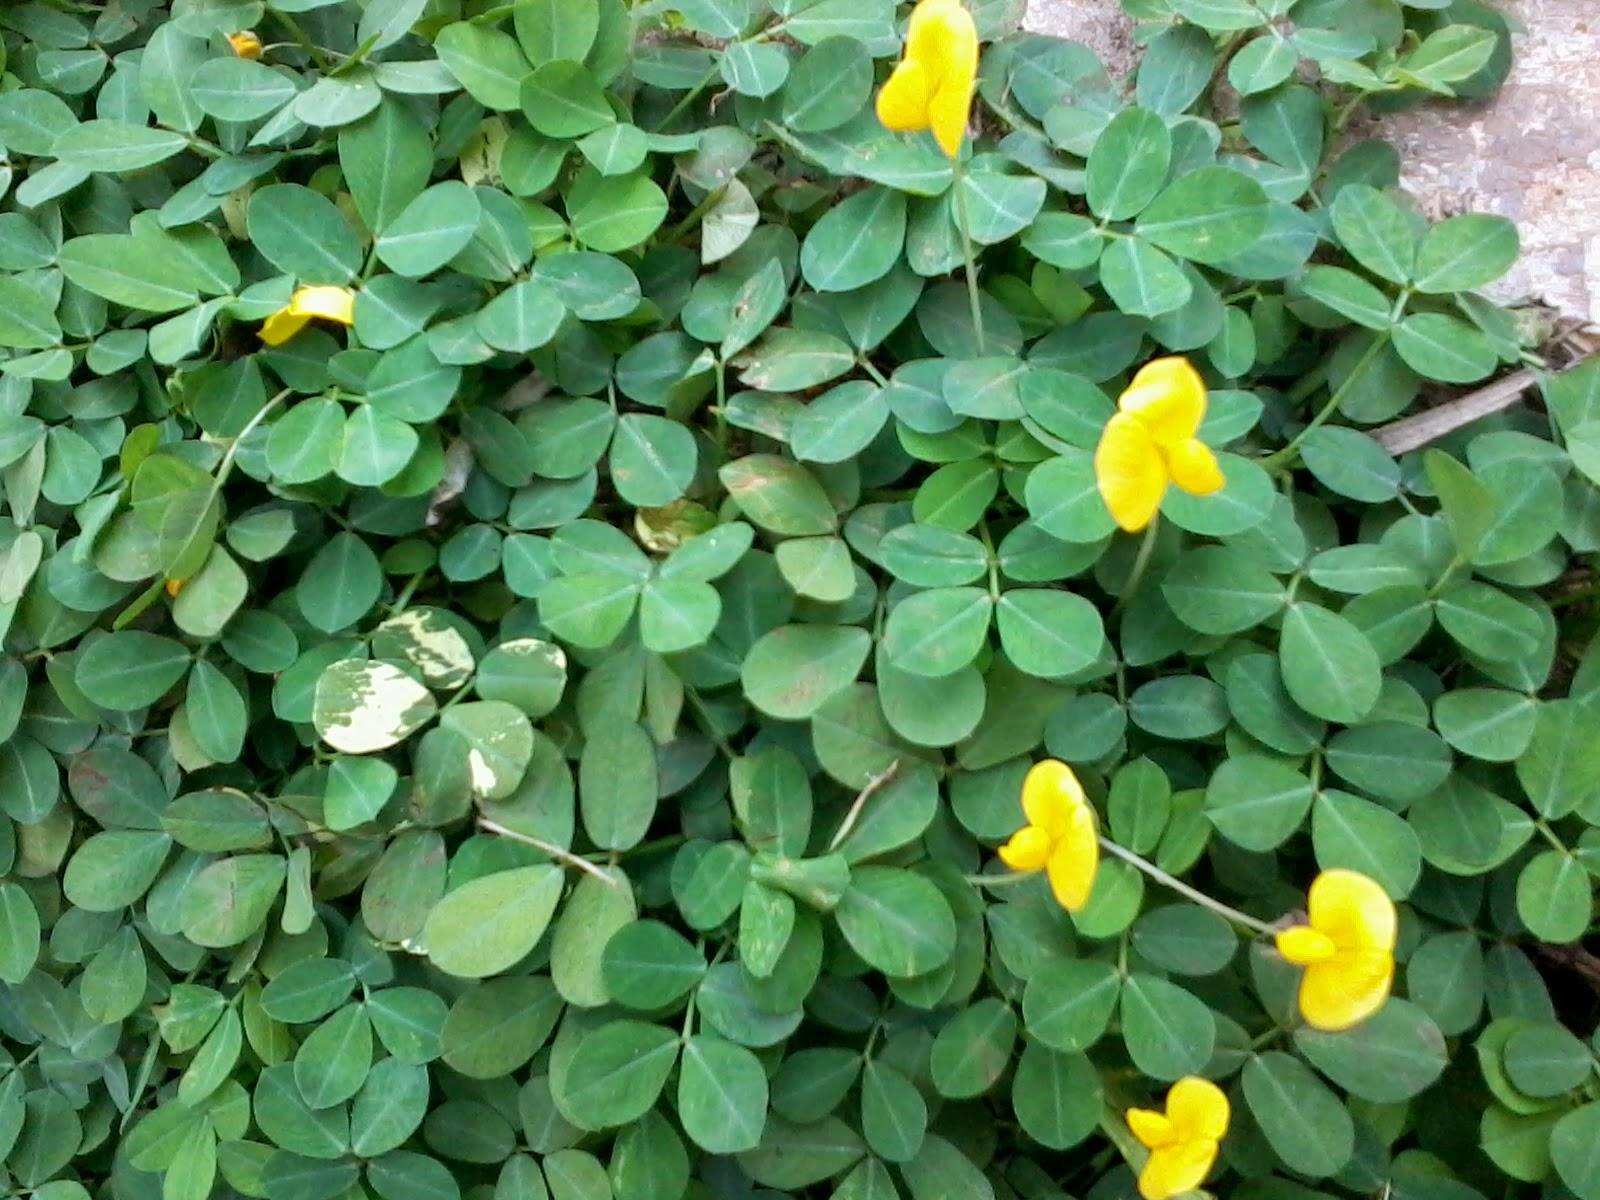 jual pohon kacang-kacangan | harga landep | tanaman hias landep